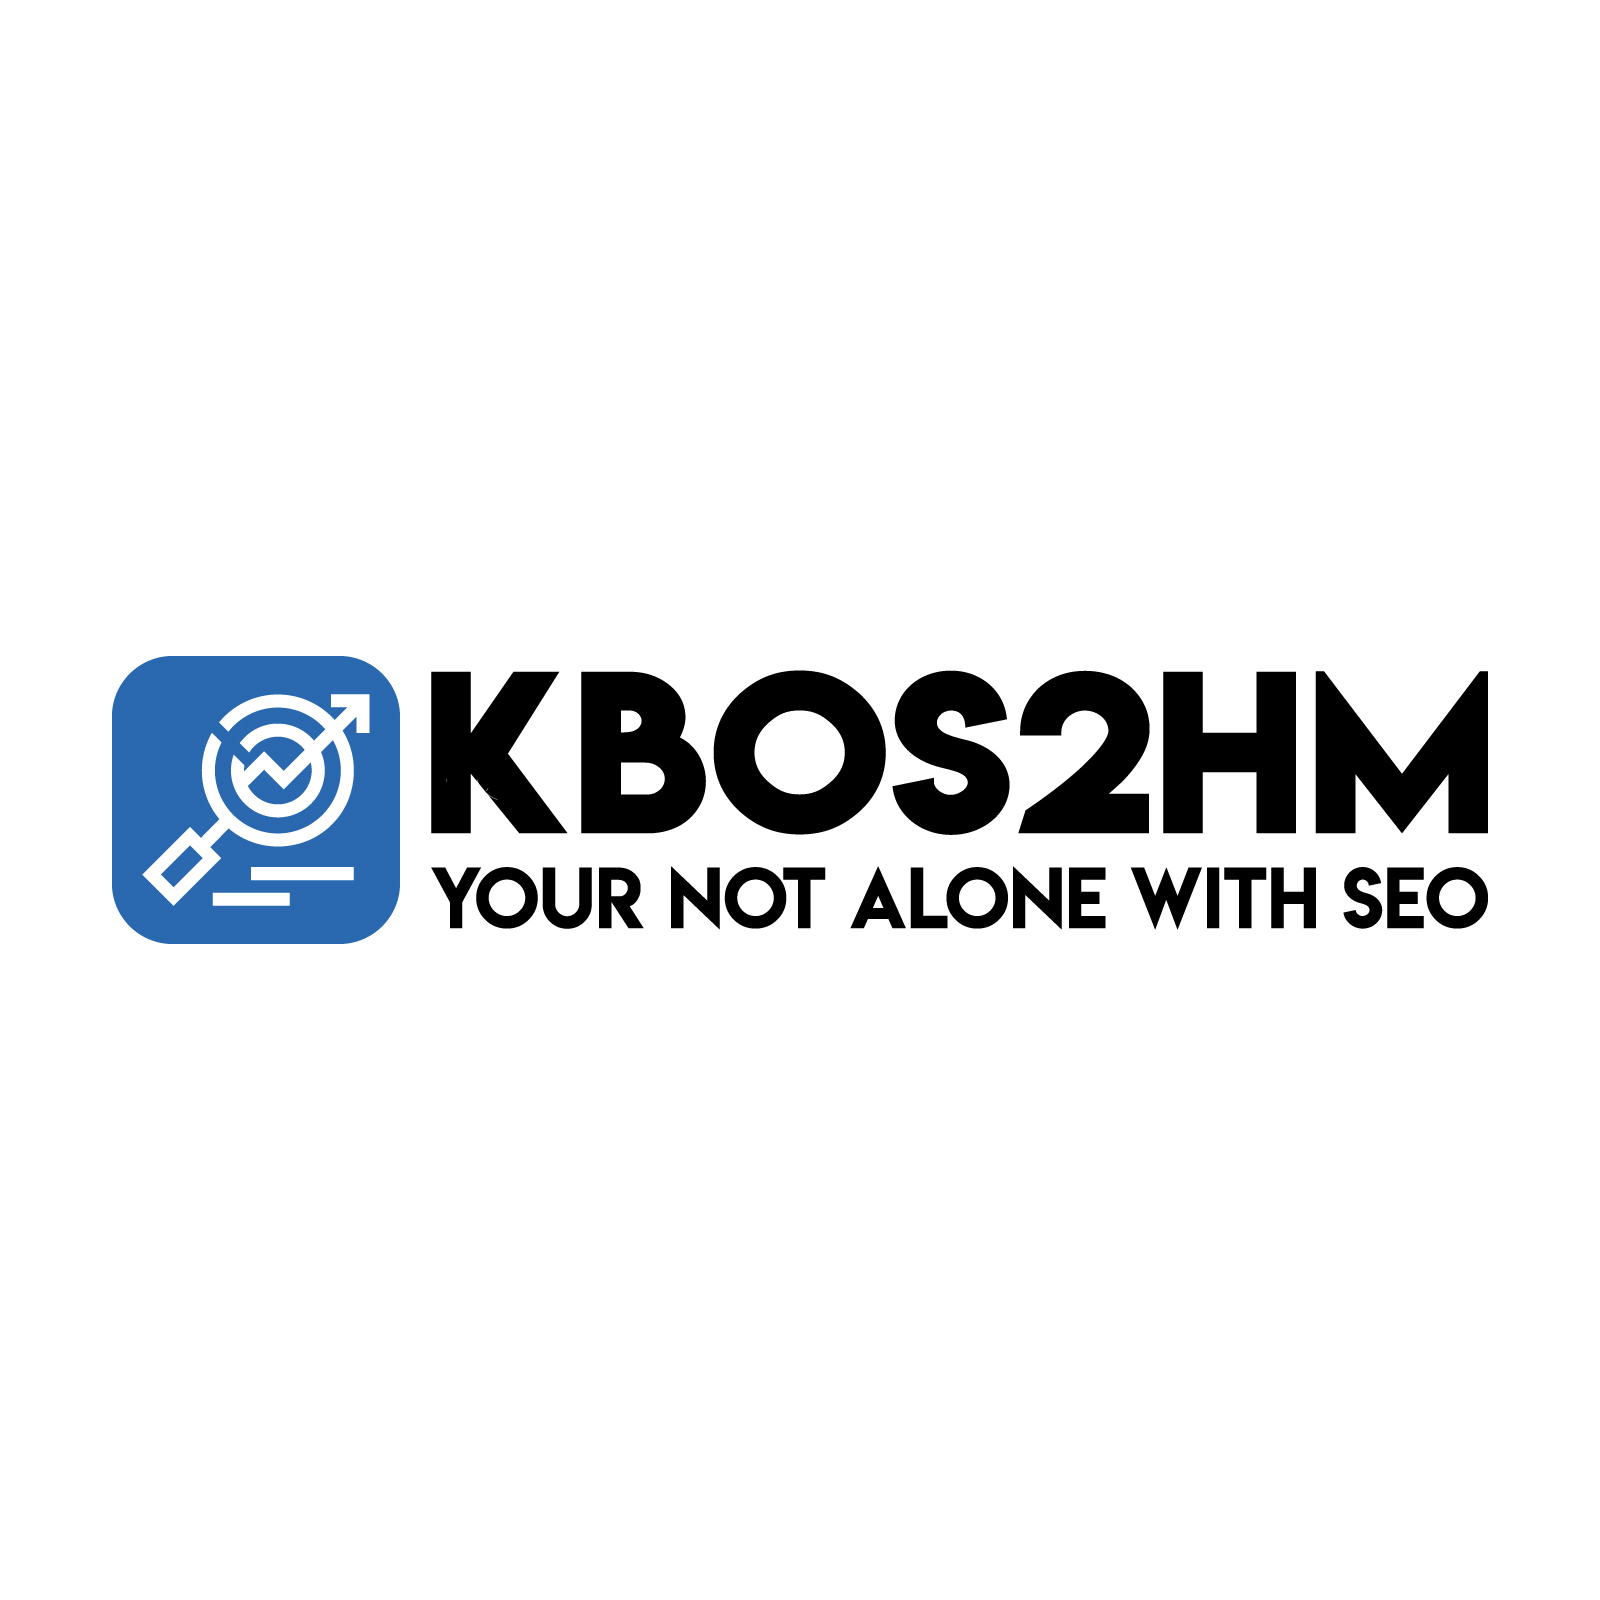 Kbos2hm